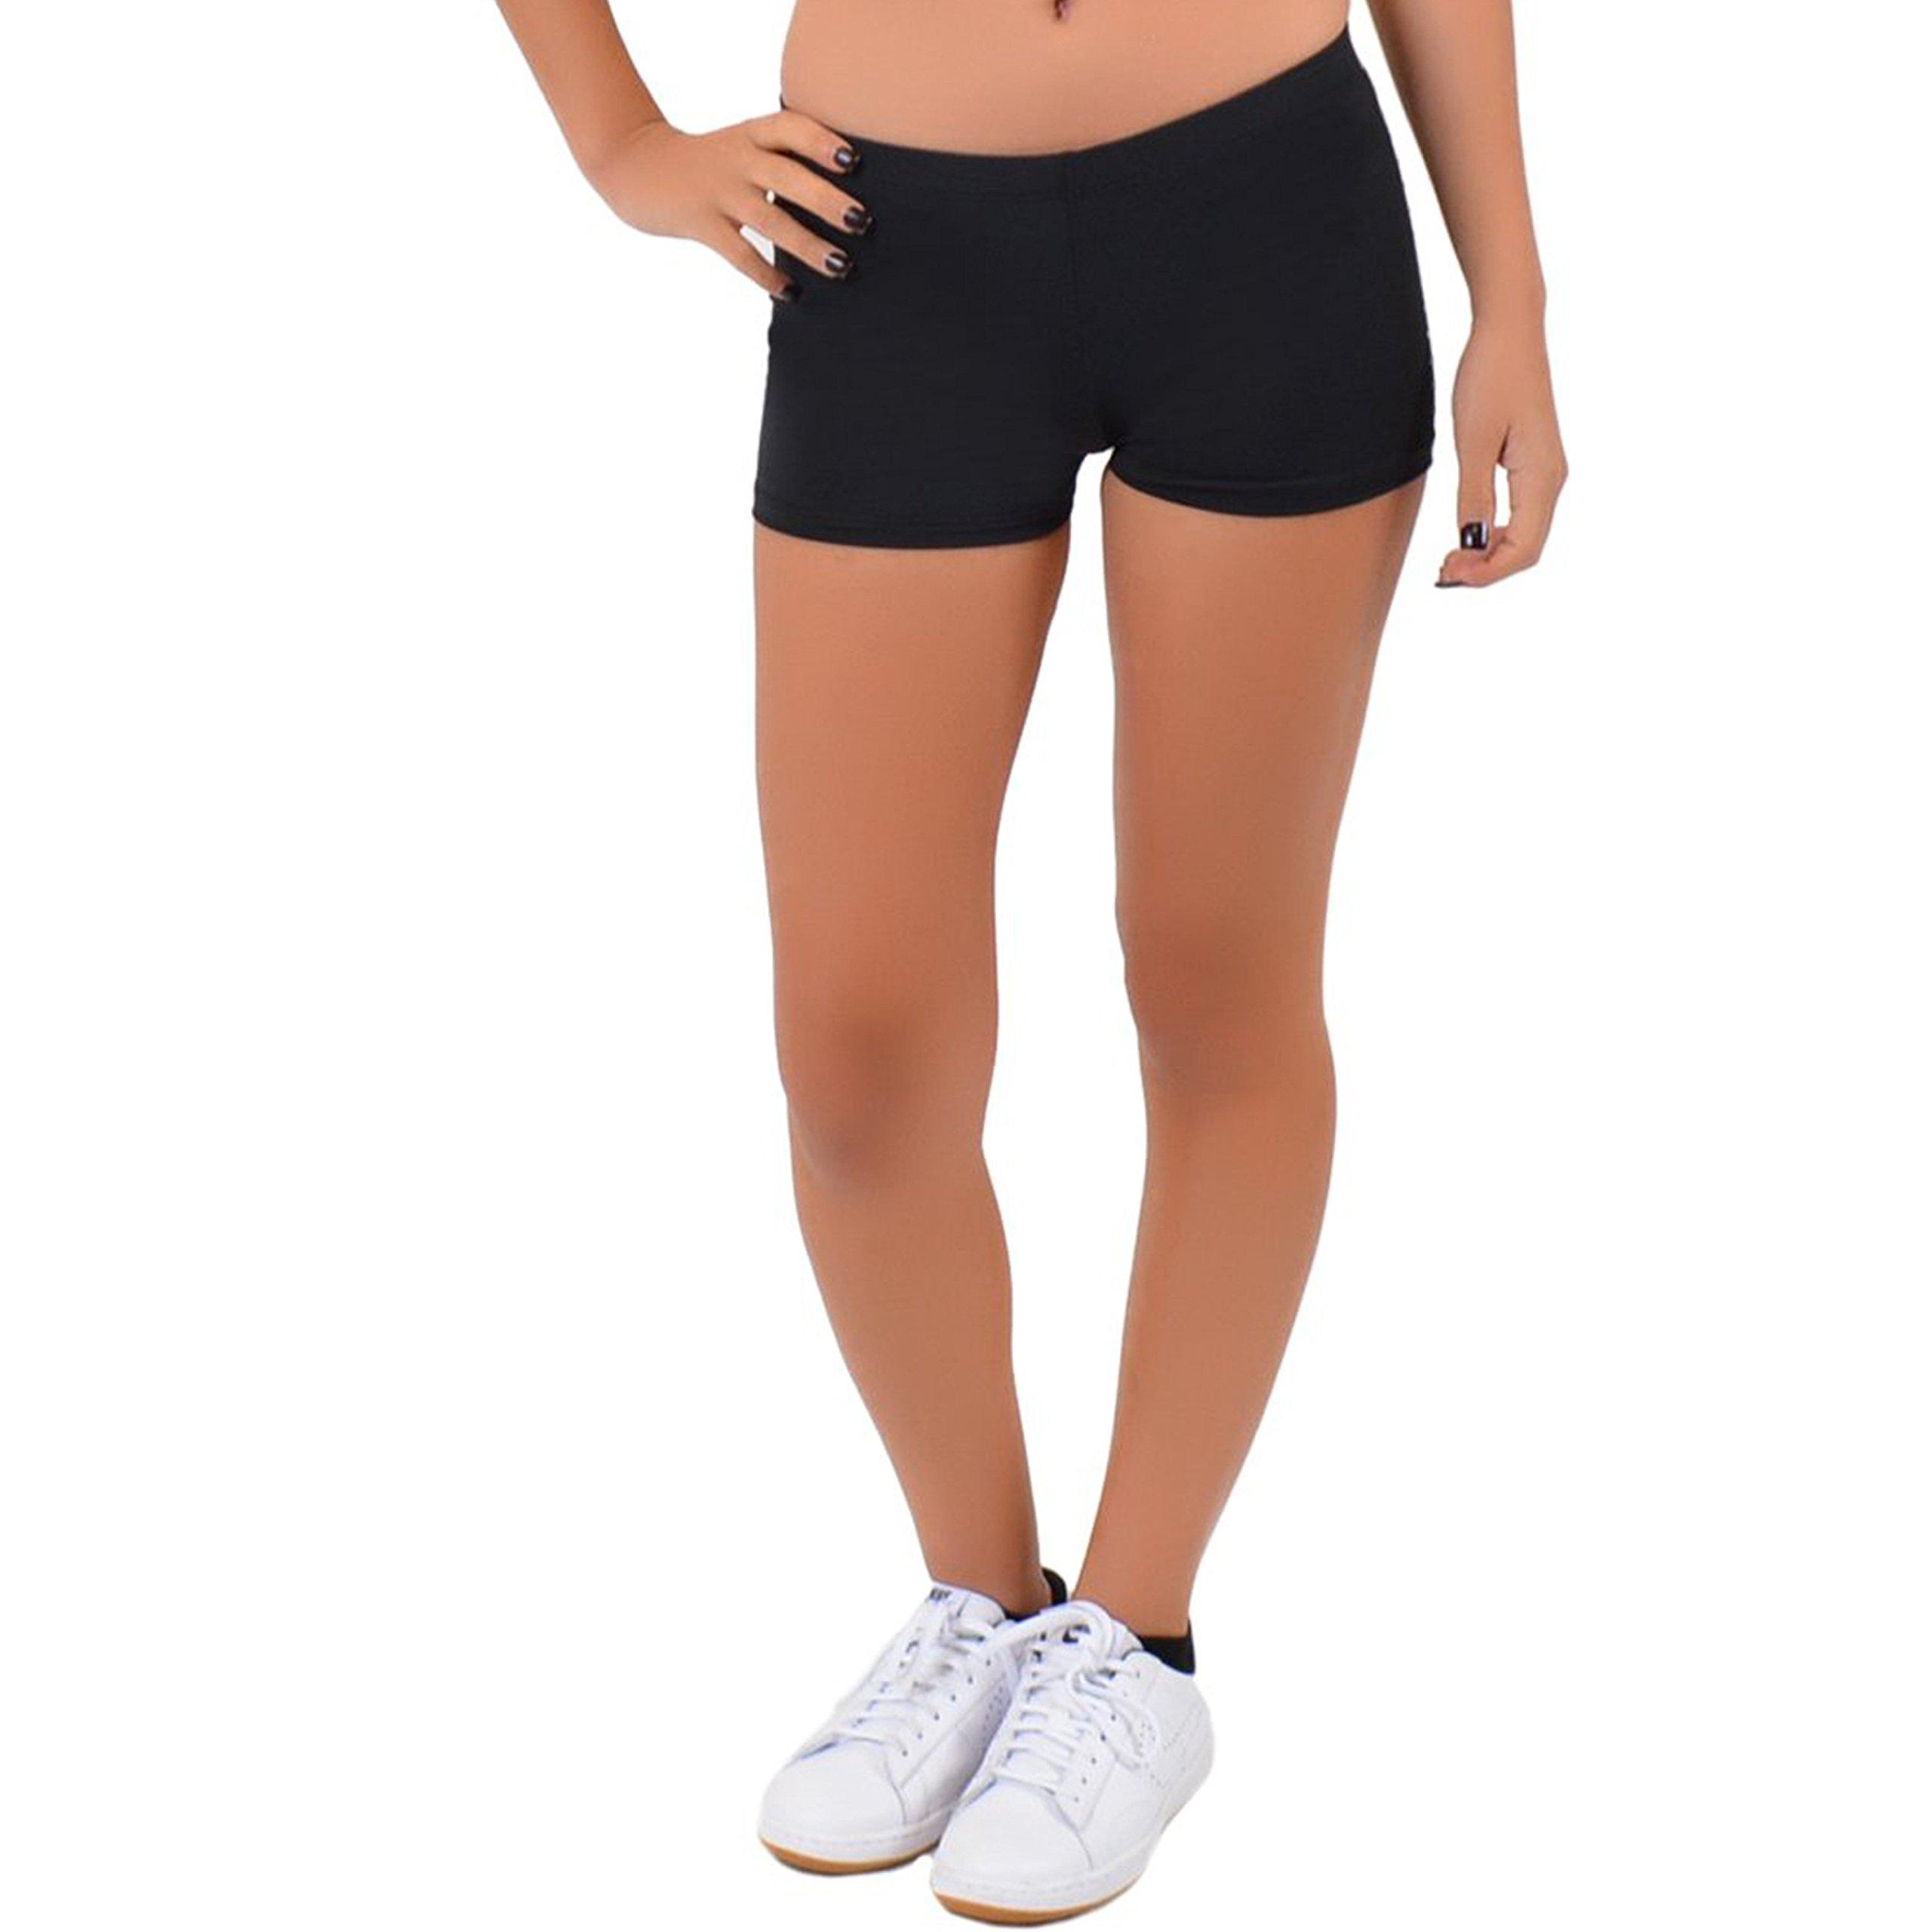 Stretch is Comfort Women's Nylon Spandex Stretch Booty Shorts Black X-Small